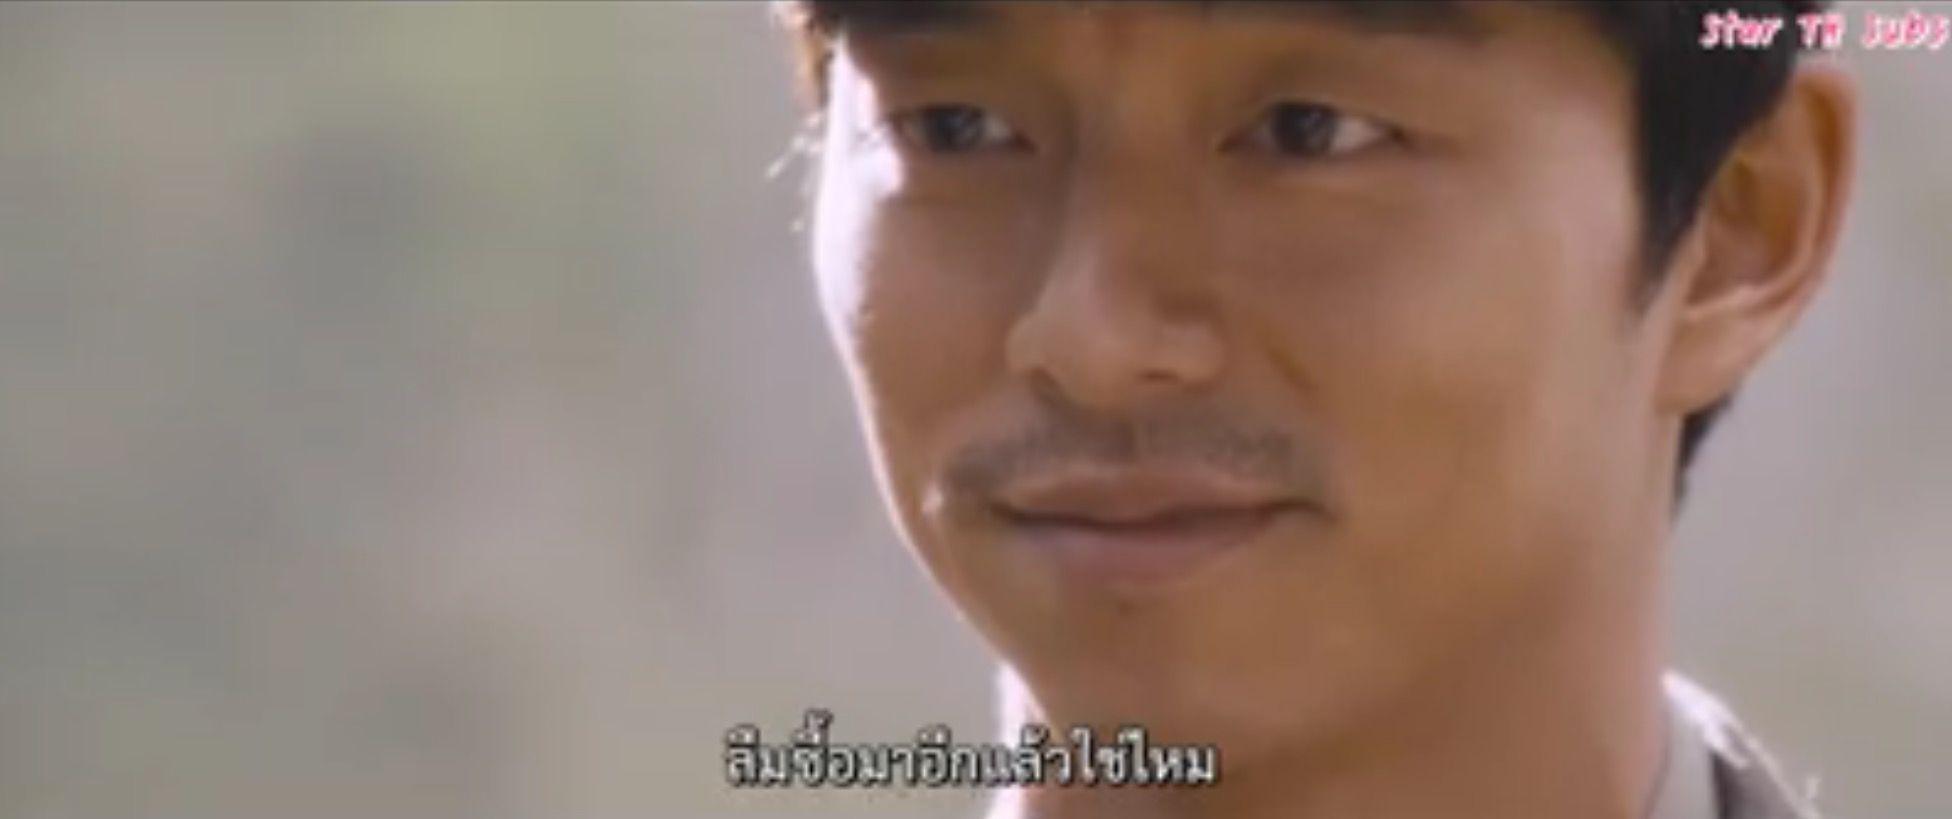 The suspect ... Gong yoo เทห์ มาก 😊😊😊